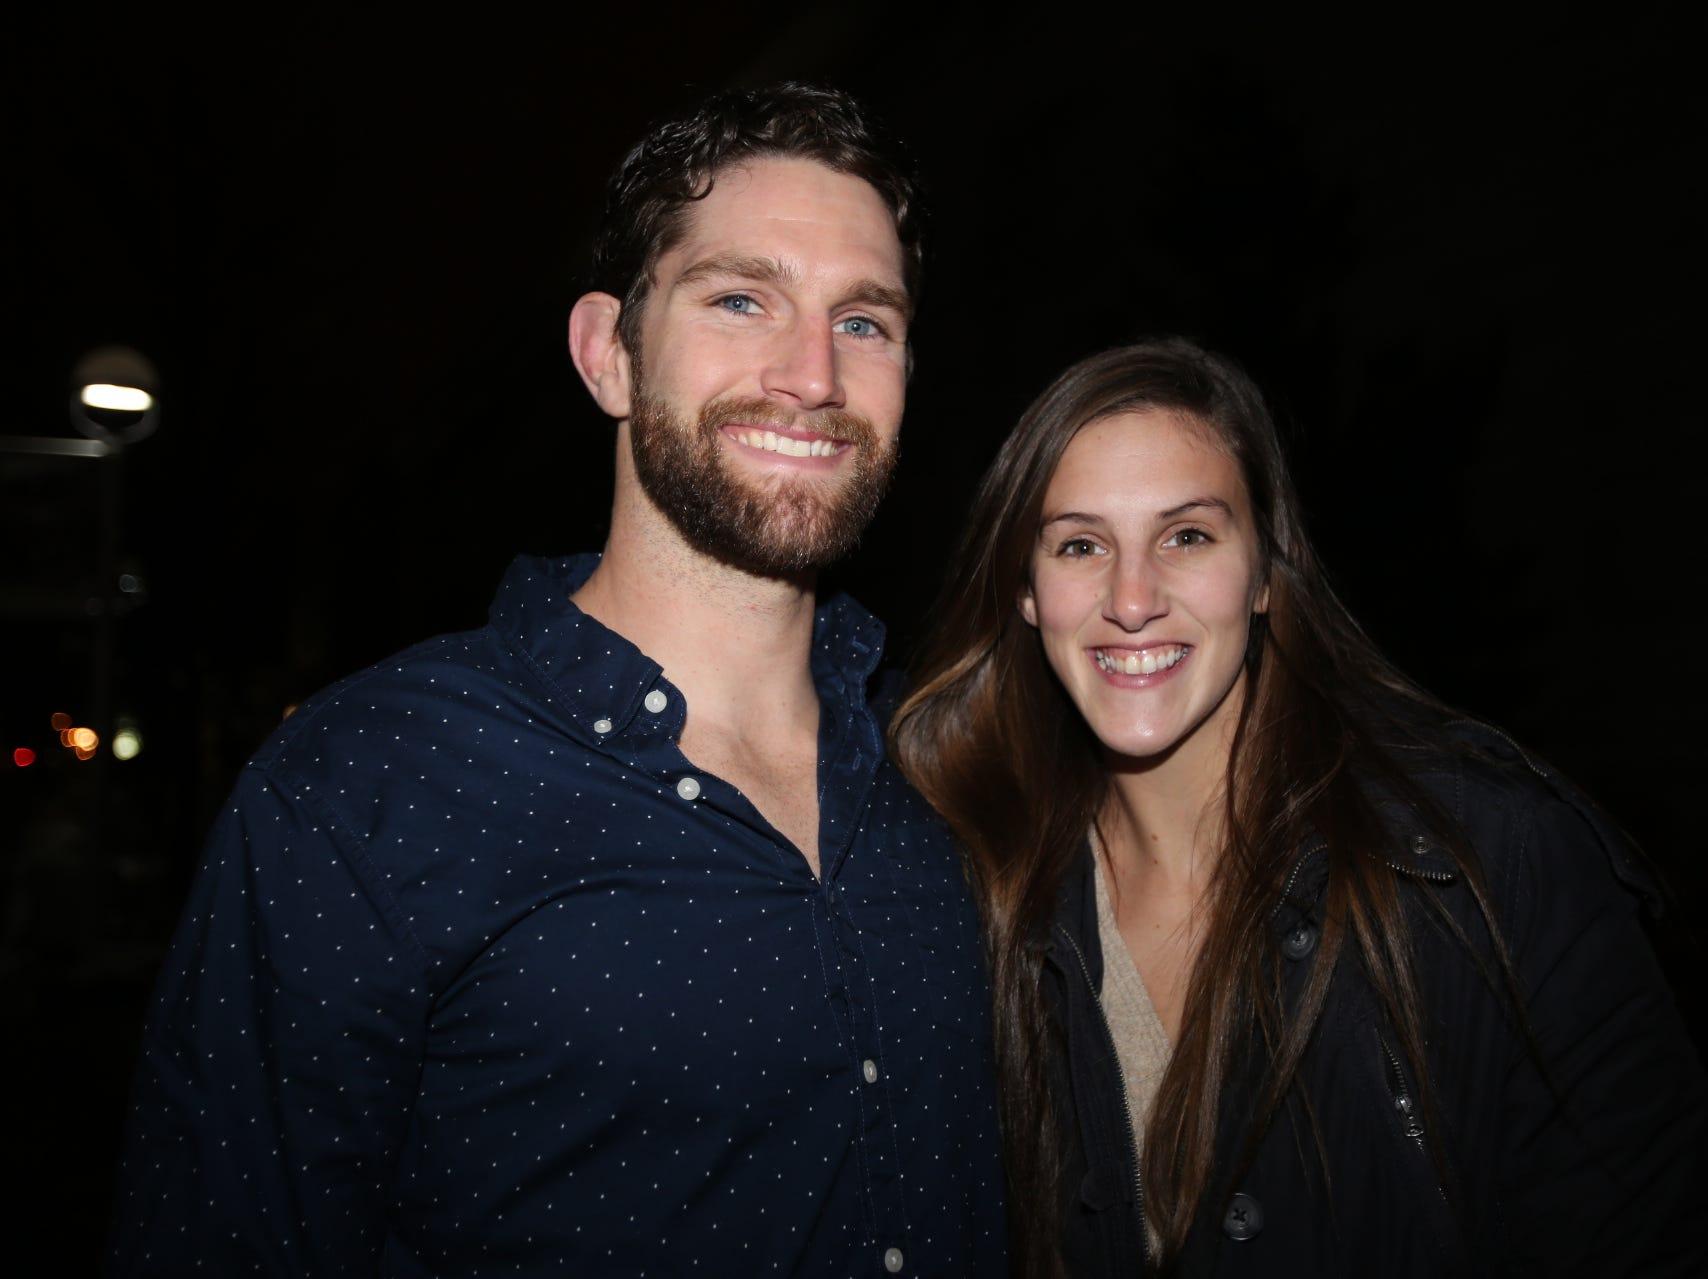 Brett Bader and Callie Maynard